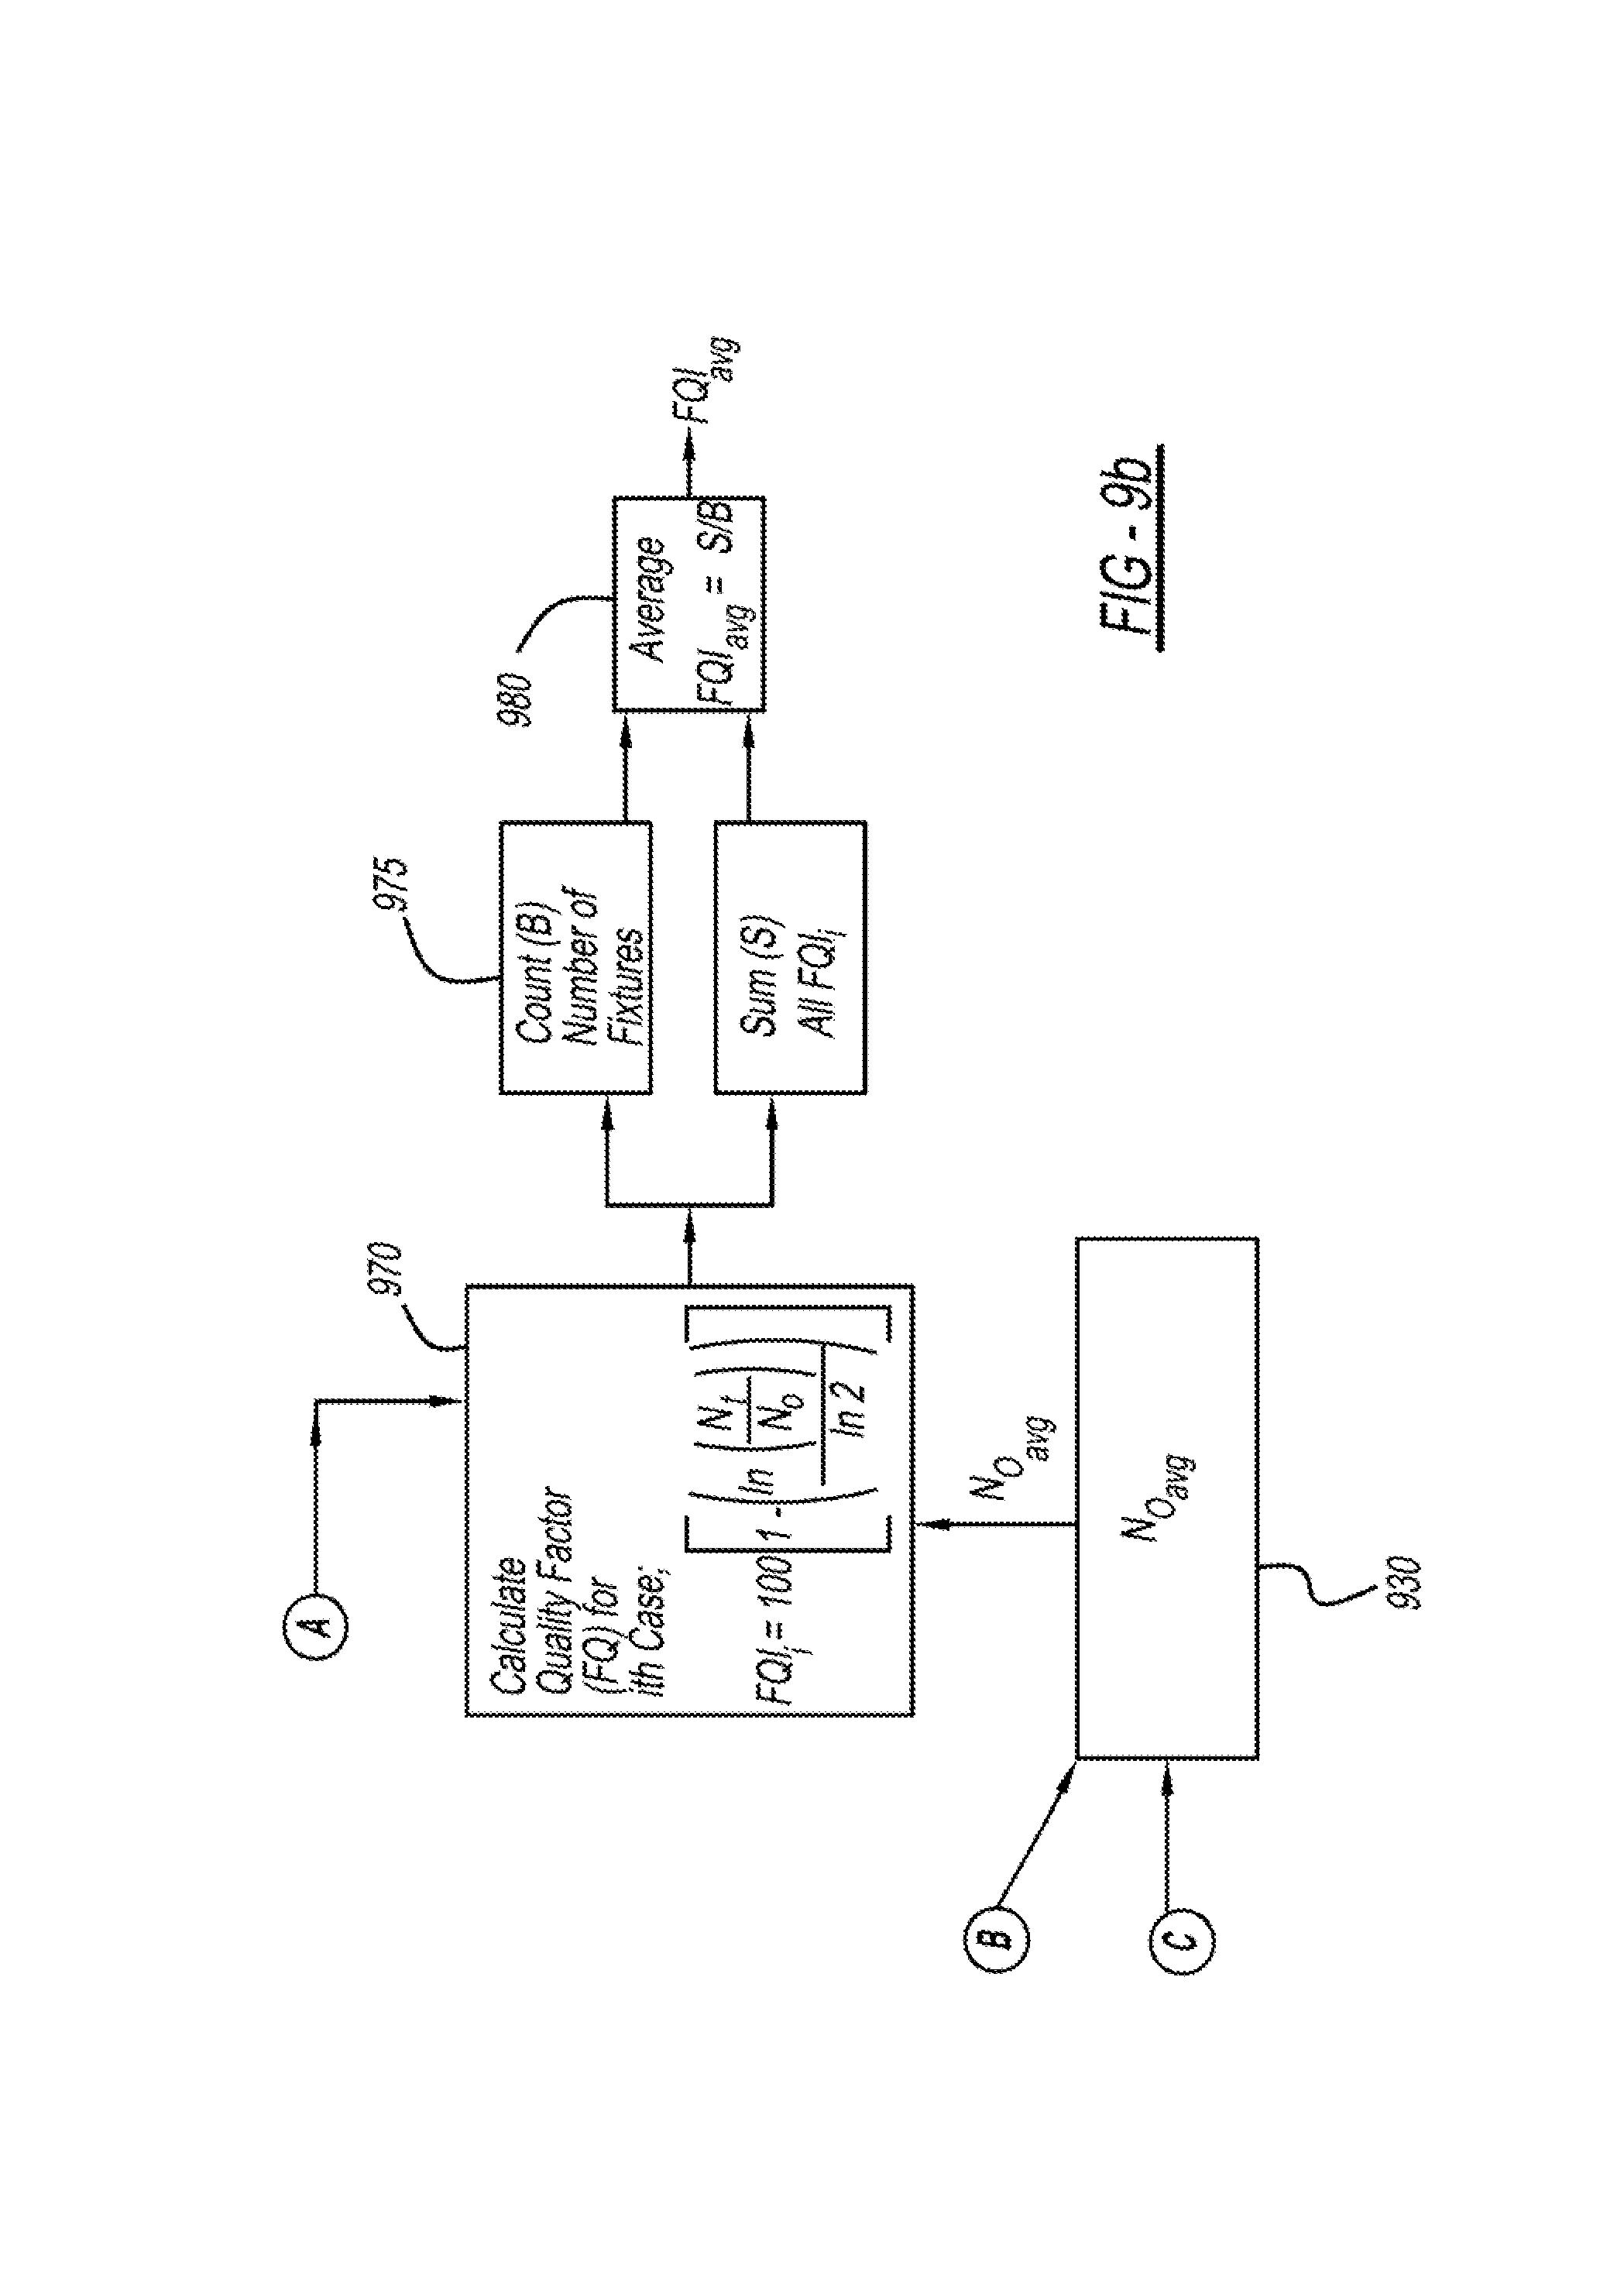 Reinke Safety Wiring Diagram Hot Wire Data Schema How To 700r4 Transmission Sel Light Switch